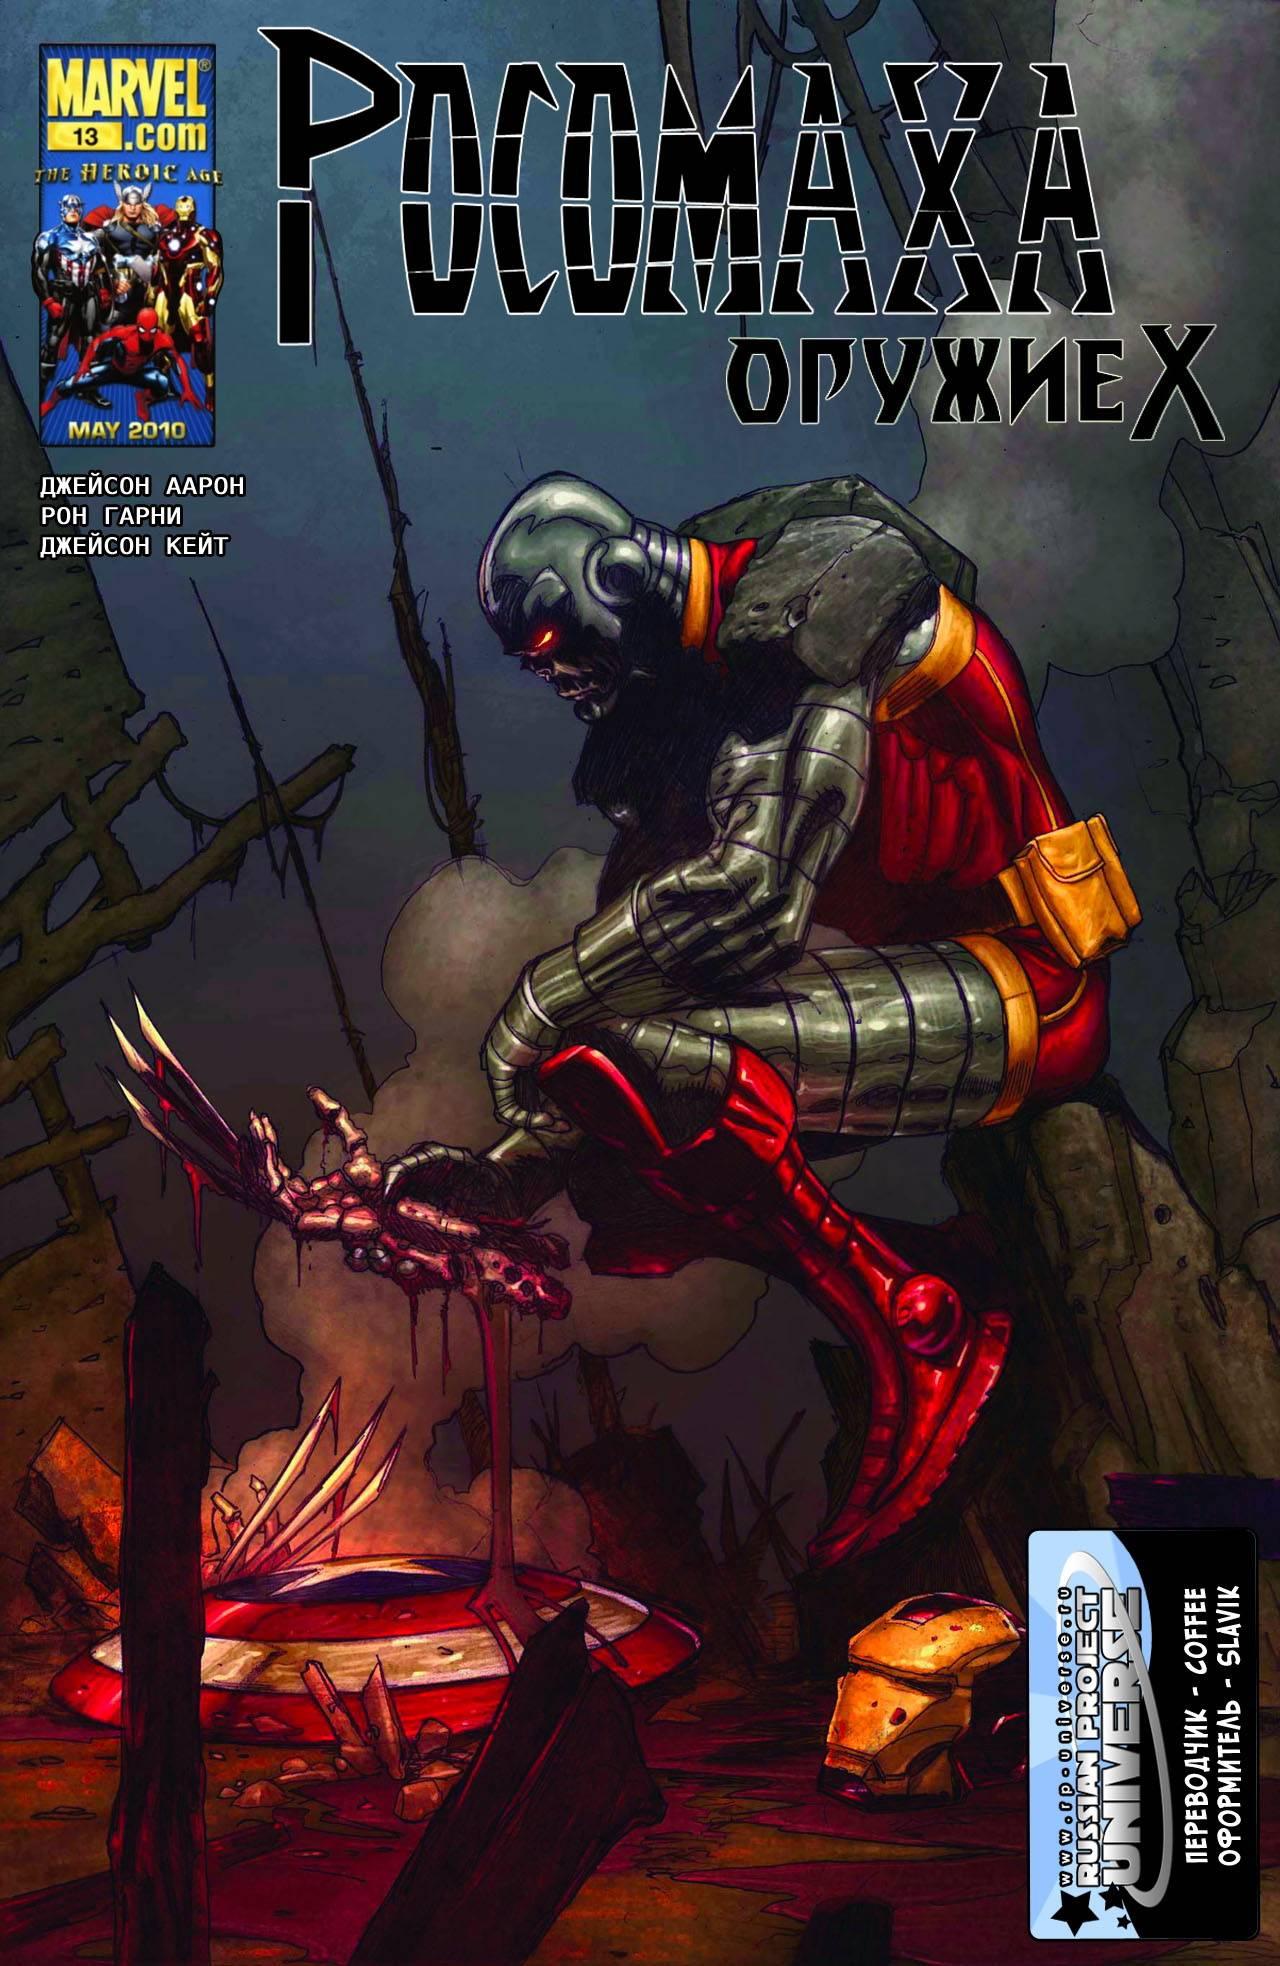 Росомаха: Оружие Икс №13 онлайн